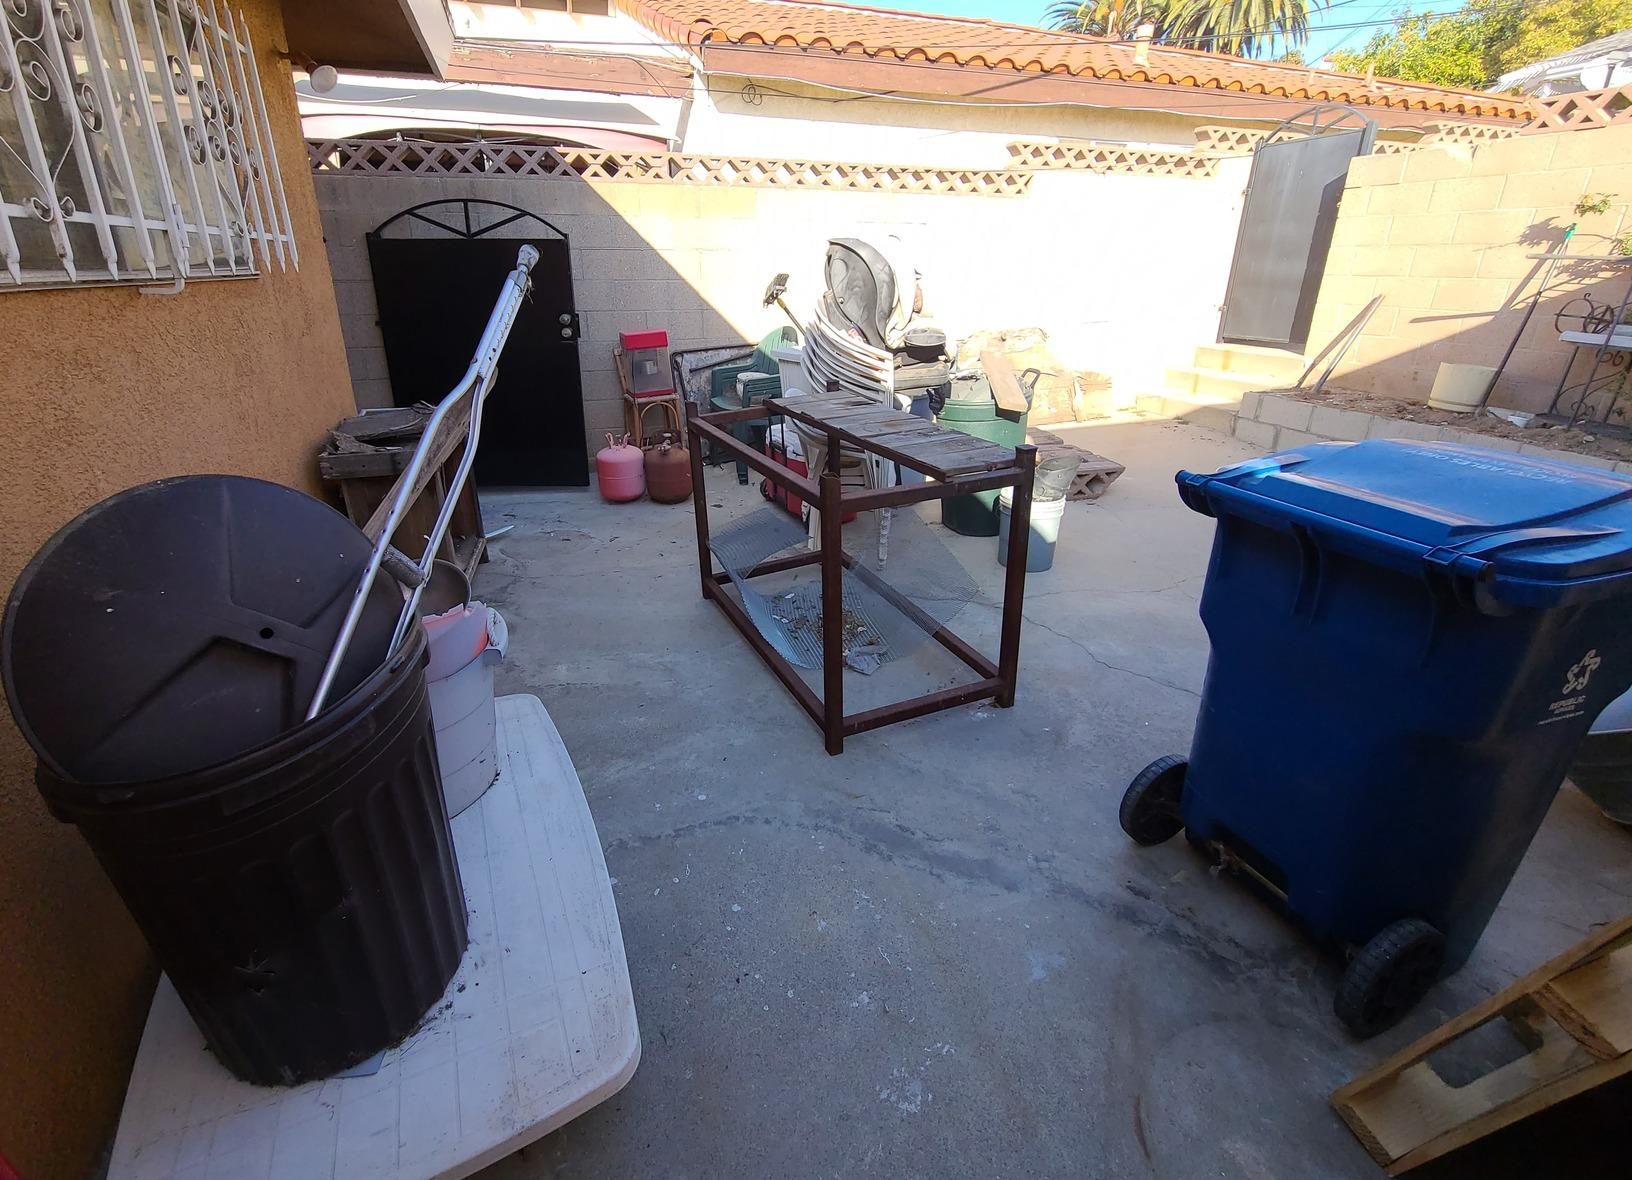 Backyard Junk Removal Los Angeles, CA - Before Photo